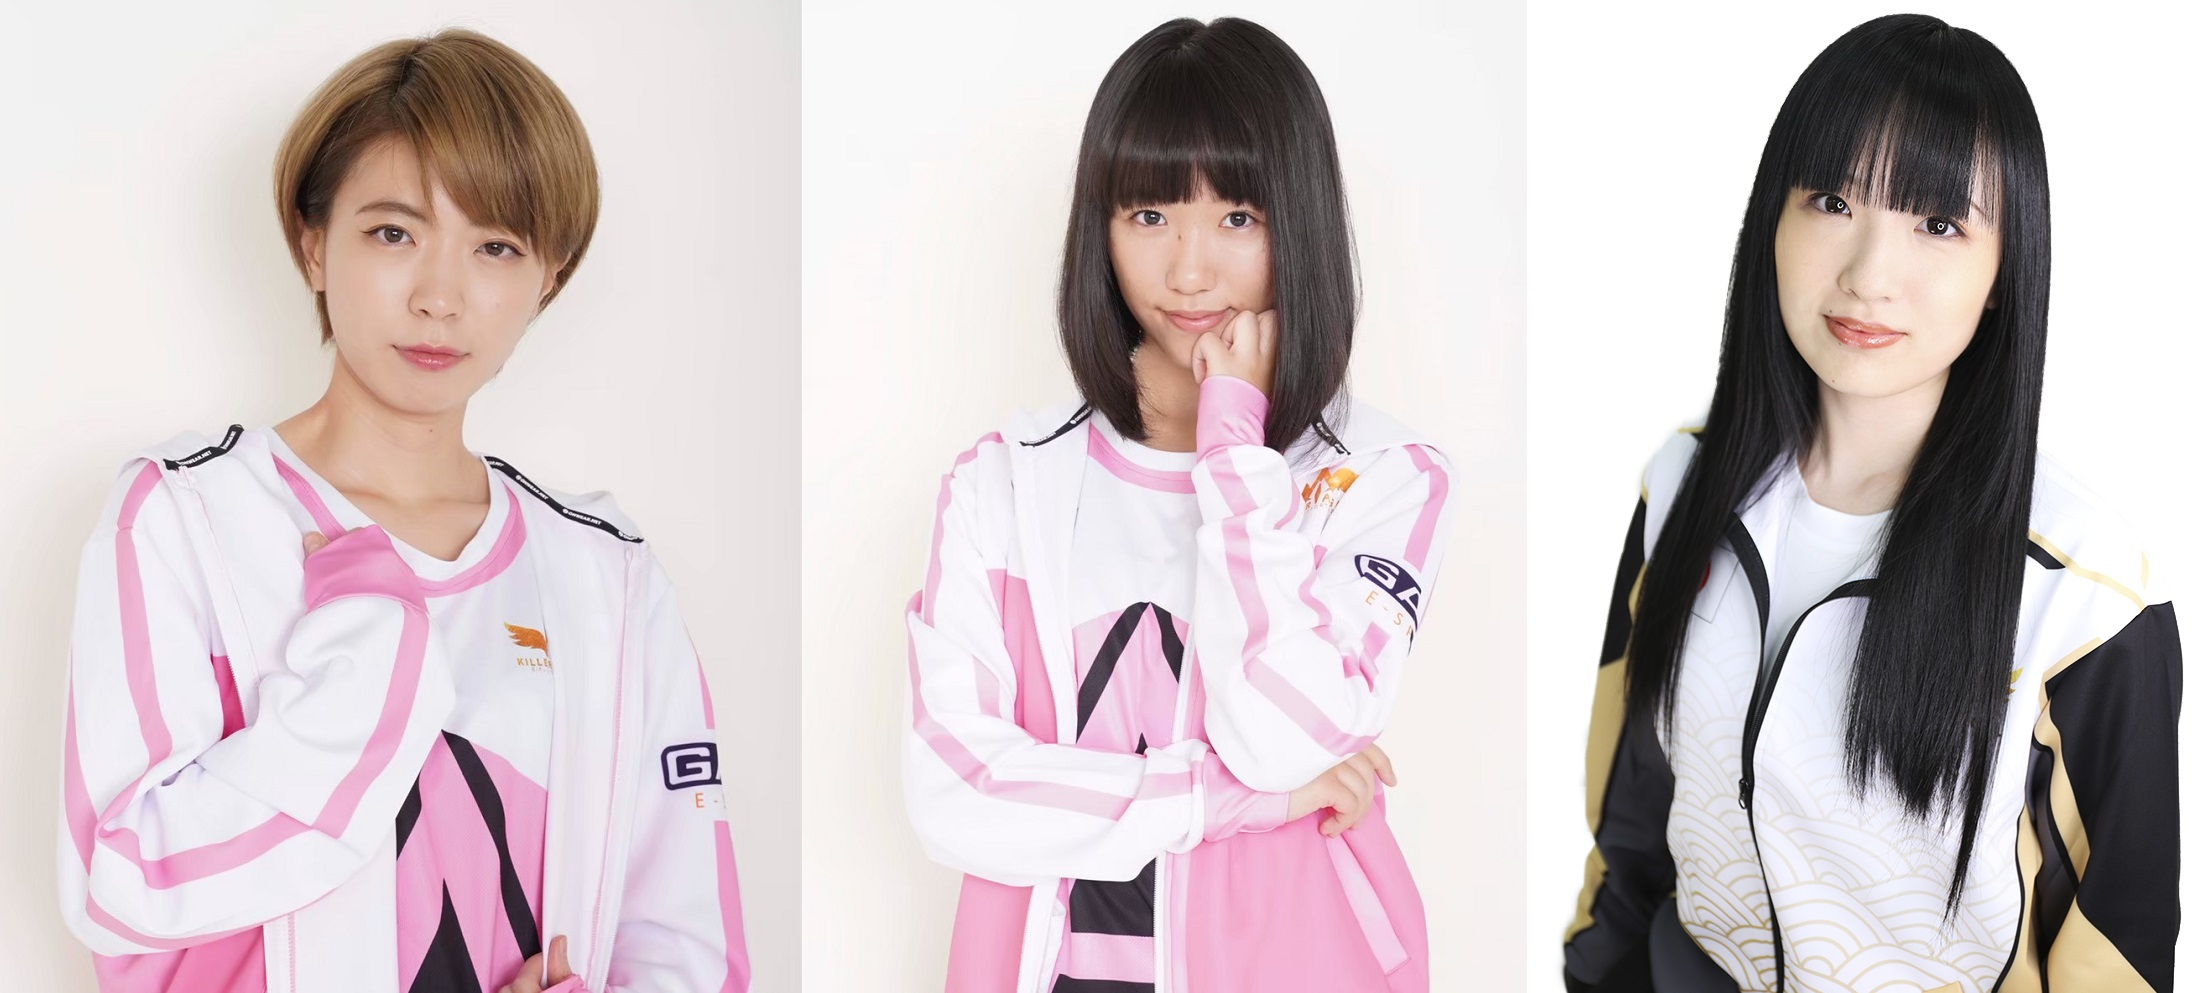 eSportStarsに参画するJapan Killer AngelのSuzuさん(左)、Nemumiさん(中央)、YUUUUUUUKAさん(右)